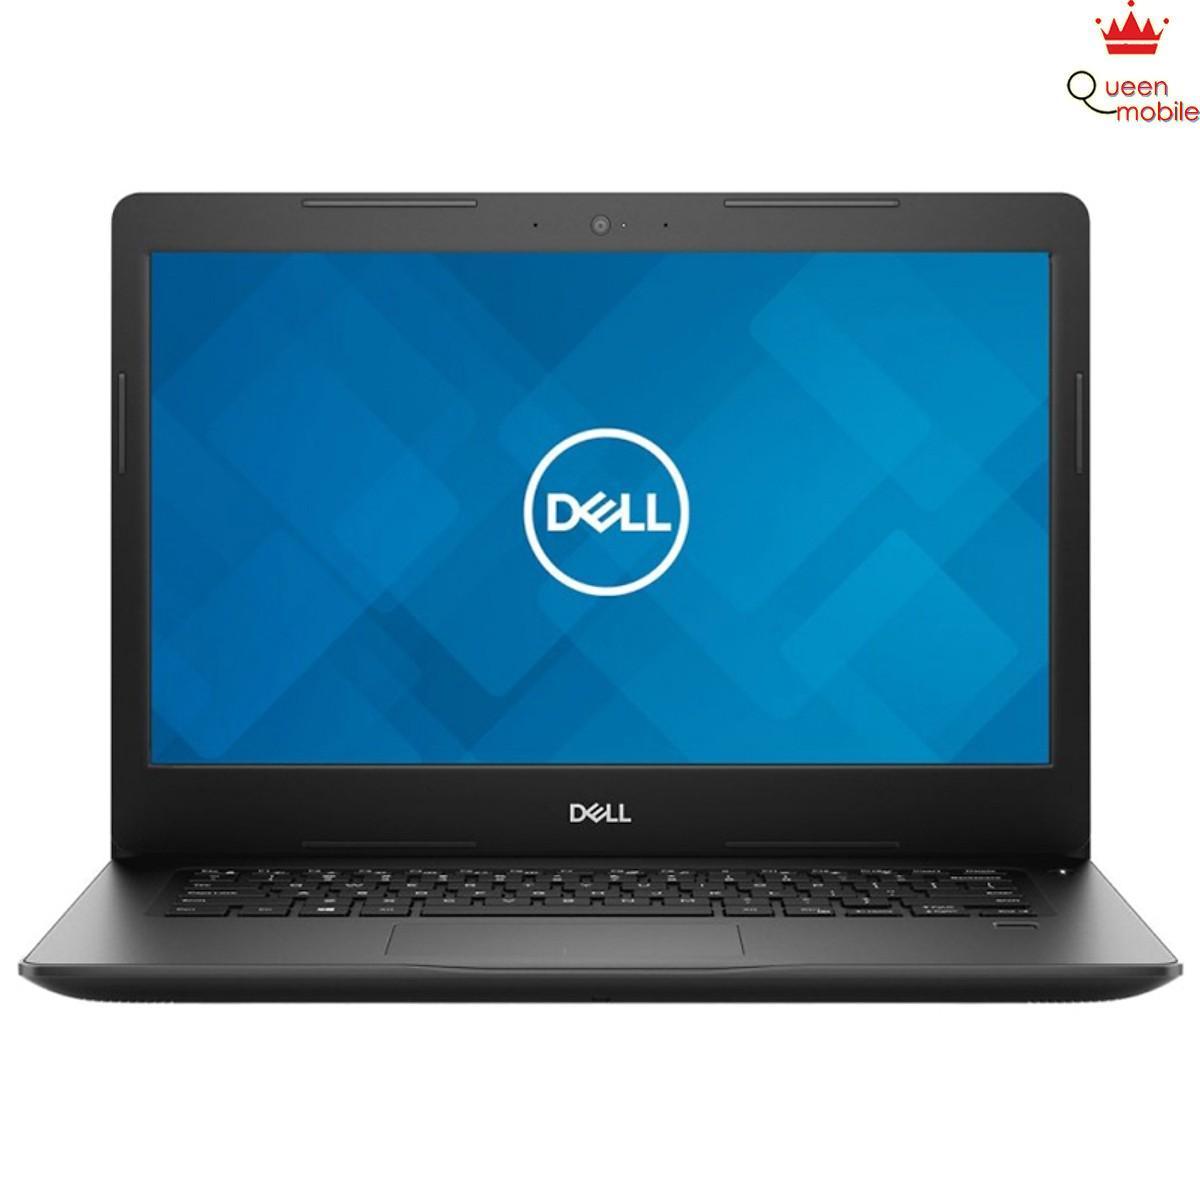 "Laptop Dell Latitude 3490 42LT340011 Core i7-8550U/ Radeon 530/ Dos (14"" HD)"